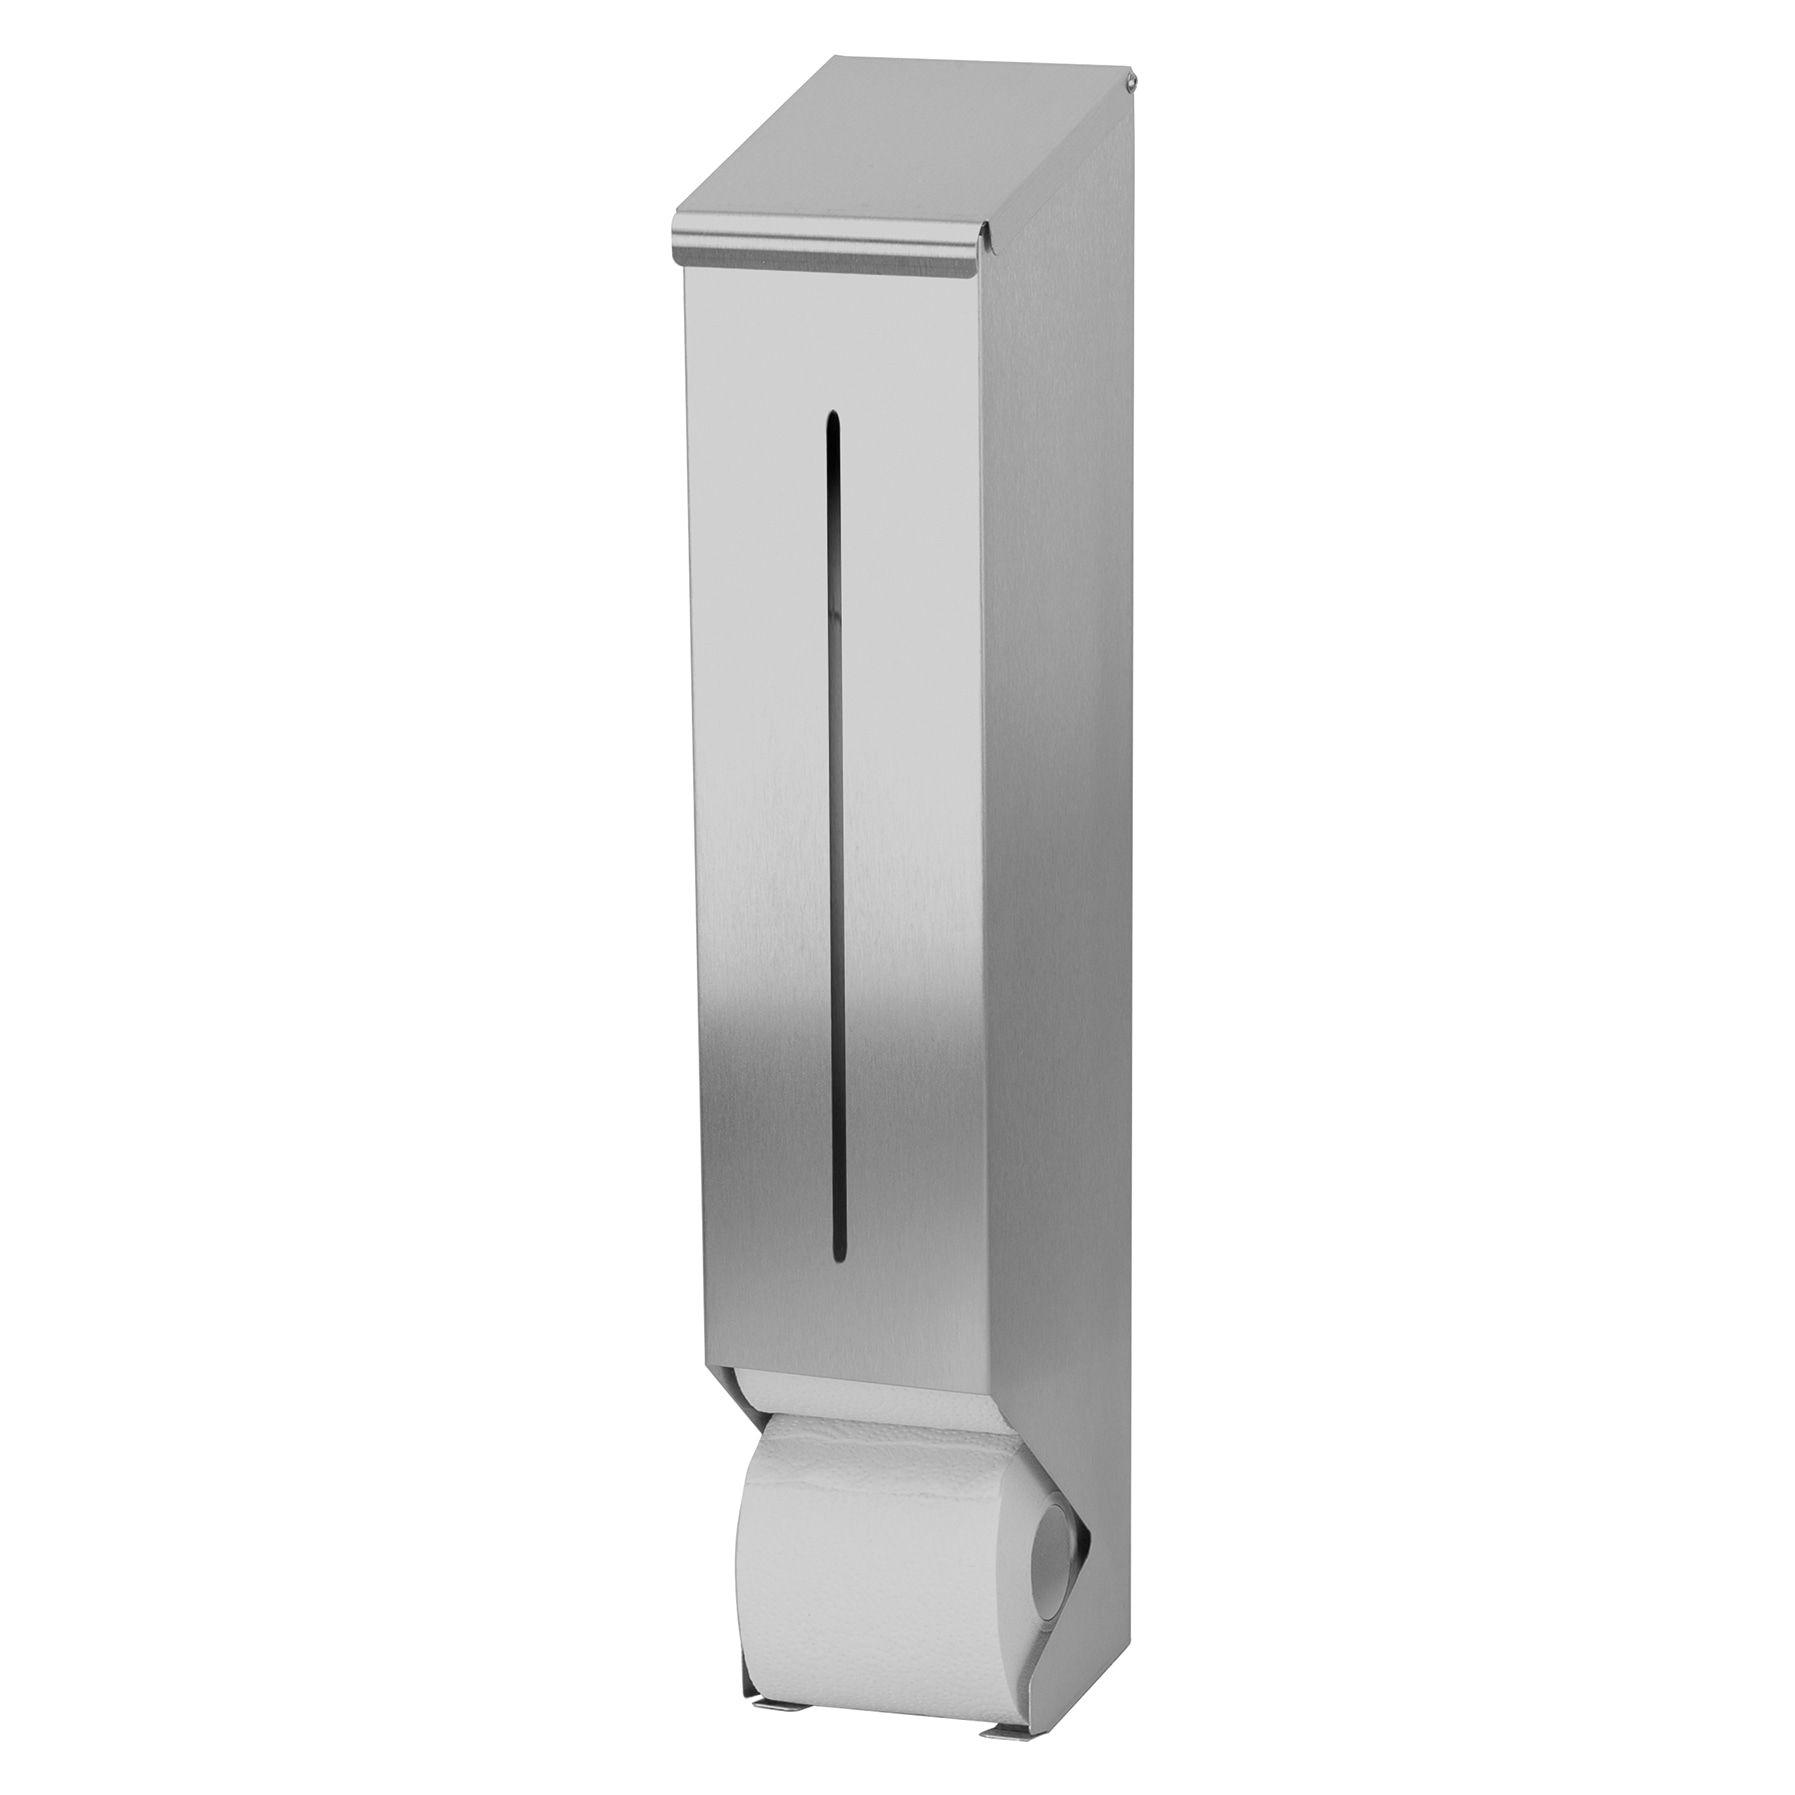 Sanfer Toiletreserverol S3400757 RVS dispenser t.b.v. 4-6 traditionele toiletrollen type R 04 E (S3400757)